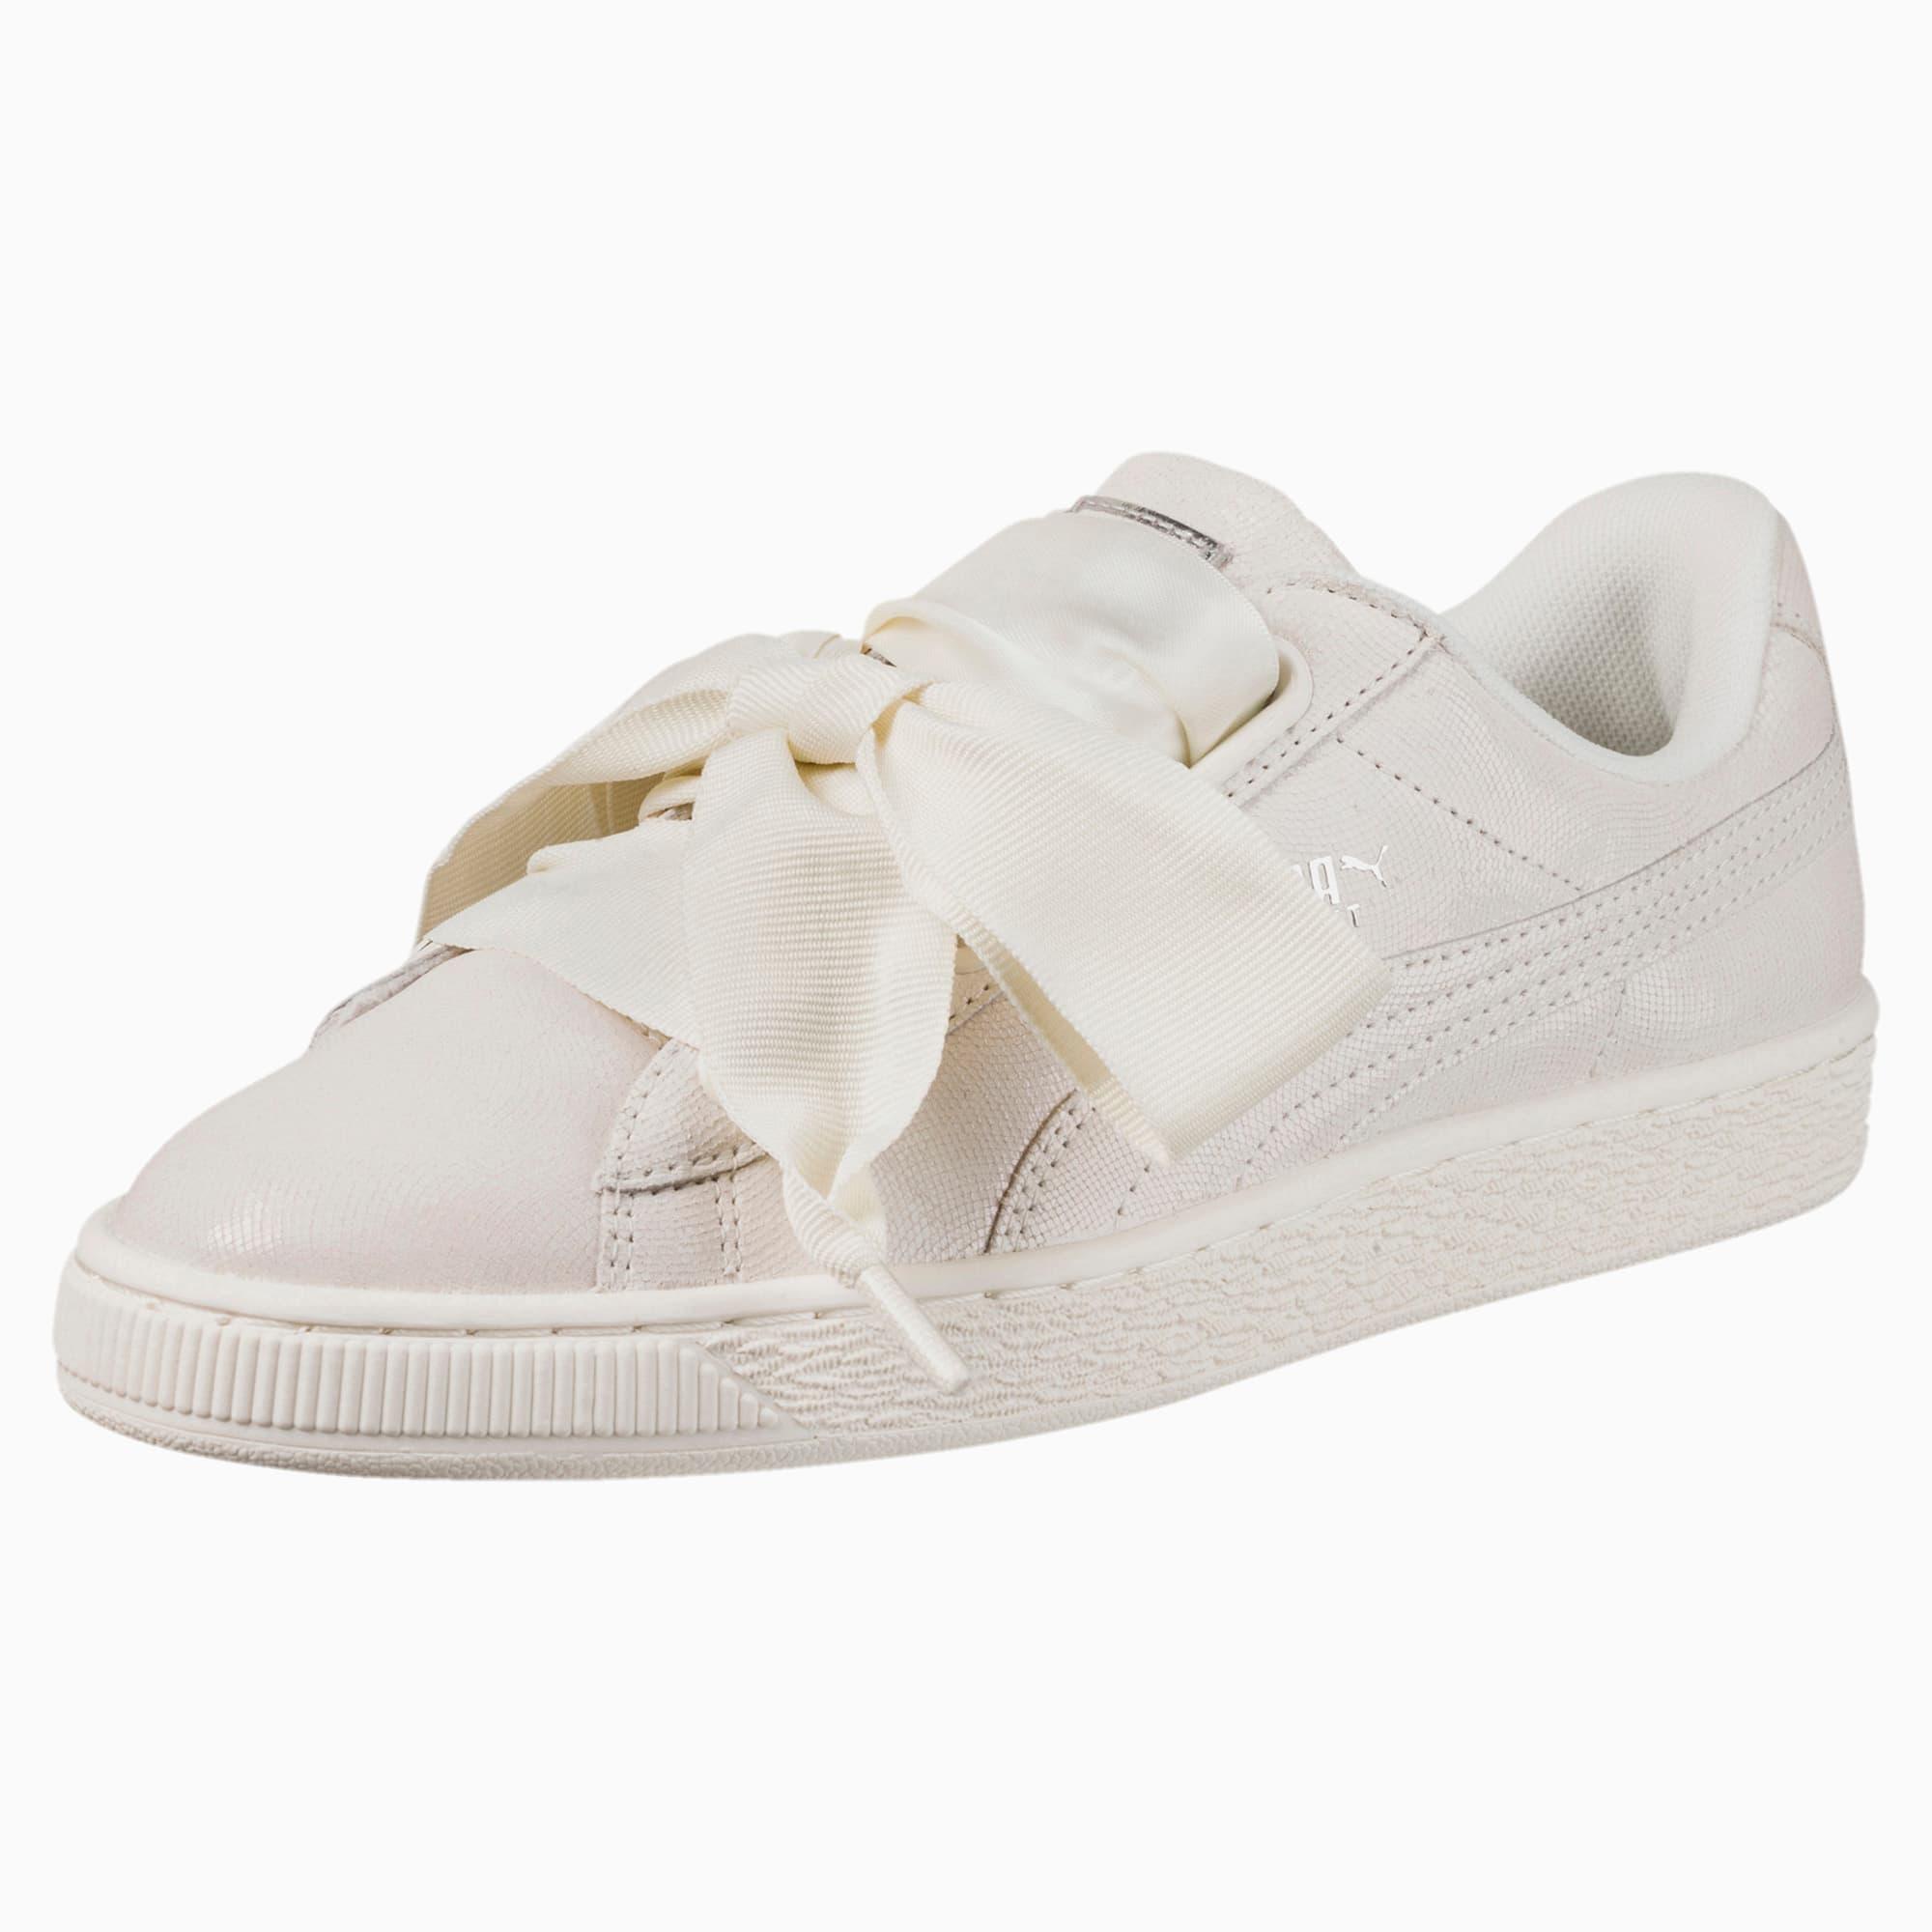 Basket Heart Night Sky Damen Sneaker | PUMA Shoes | PUMA